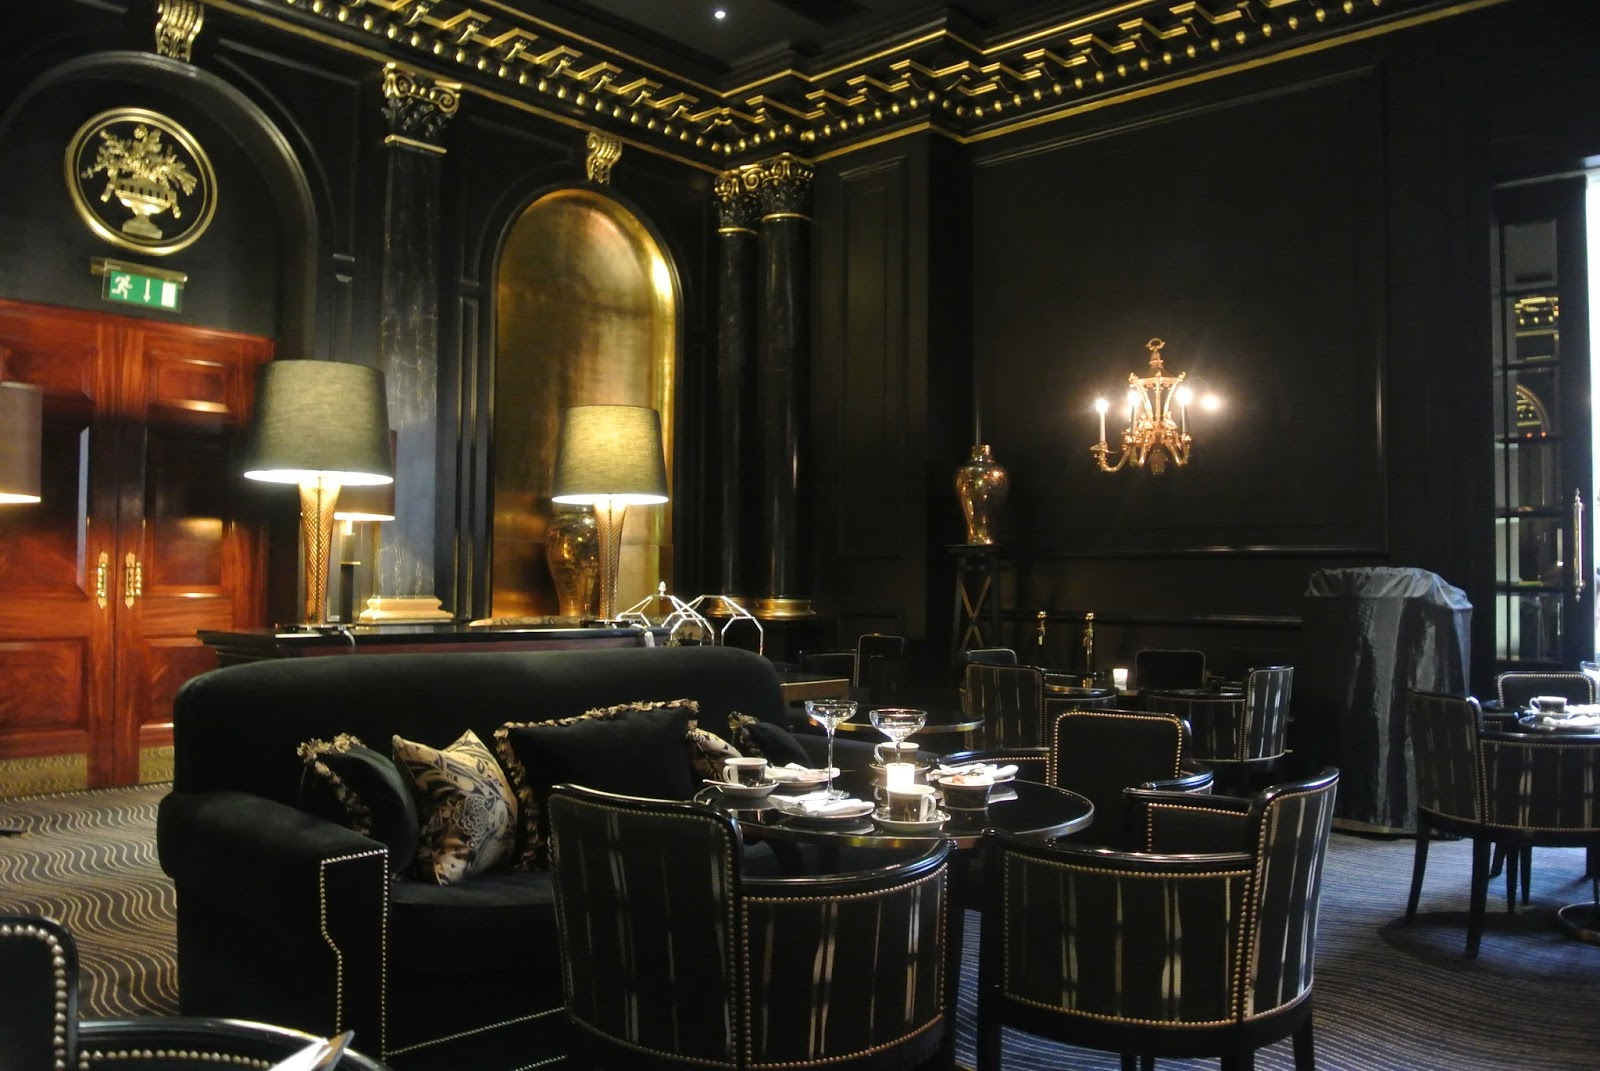 image savoy hotel bar - photo #3